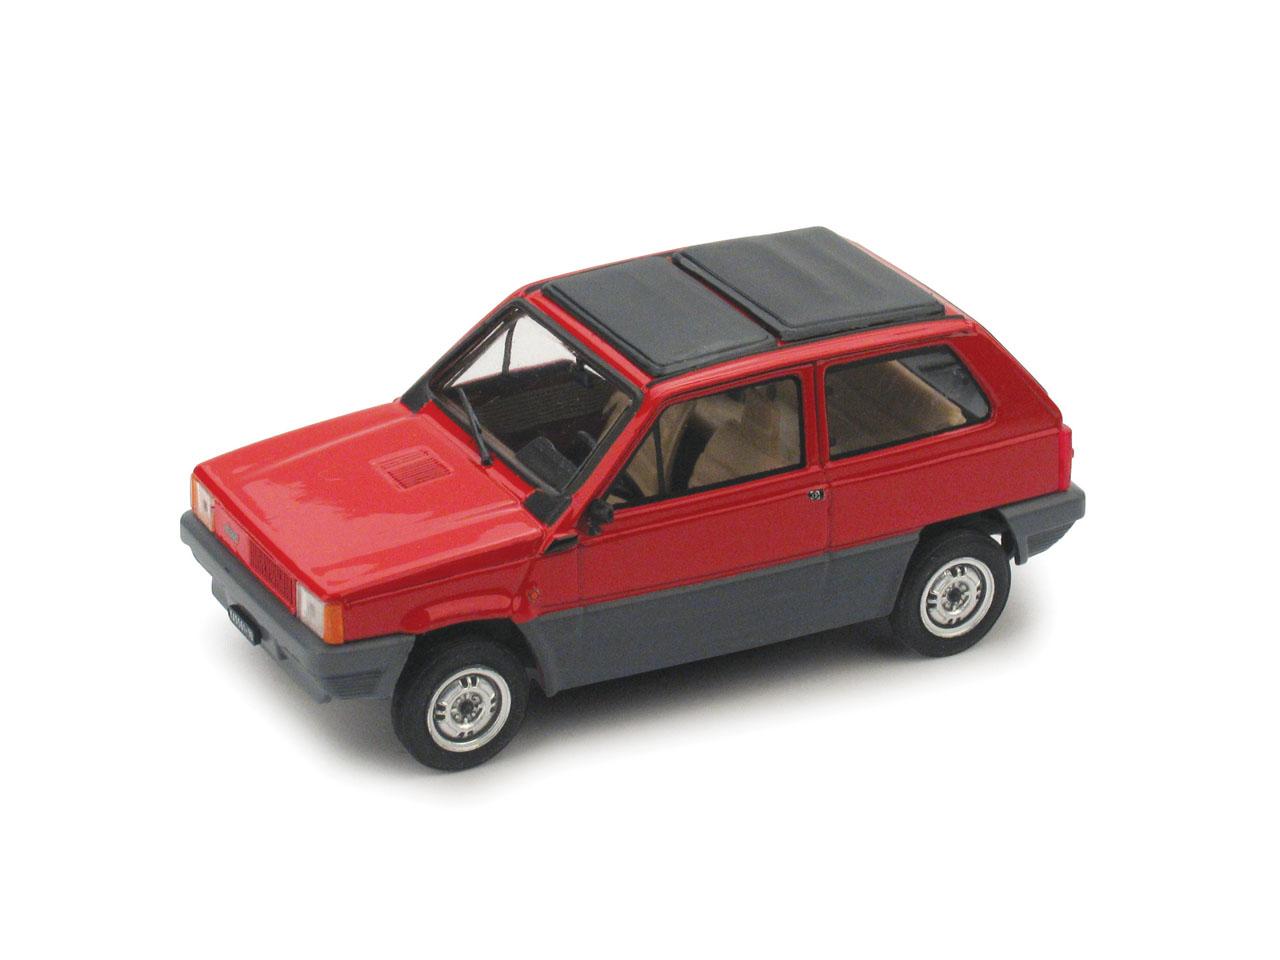 Fiat Panda 45 Techo de lona cerrado (1981) Brumm 1/43 Rojo Siam